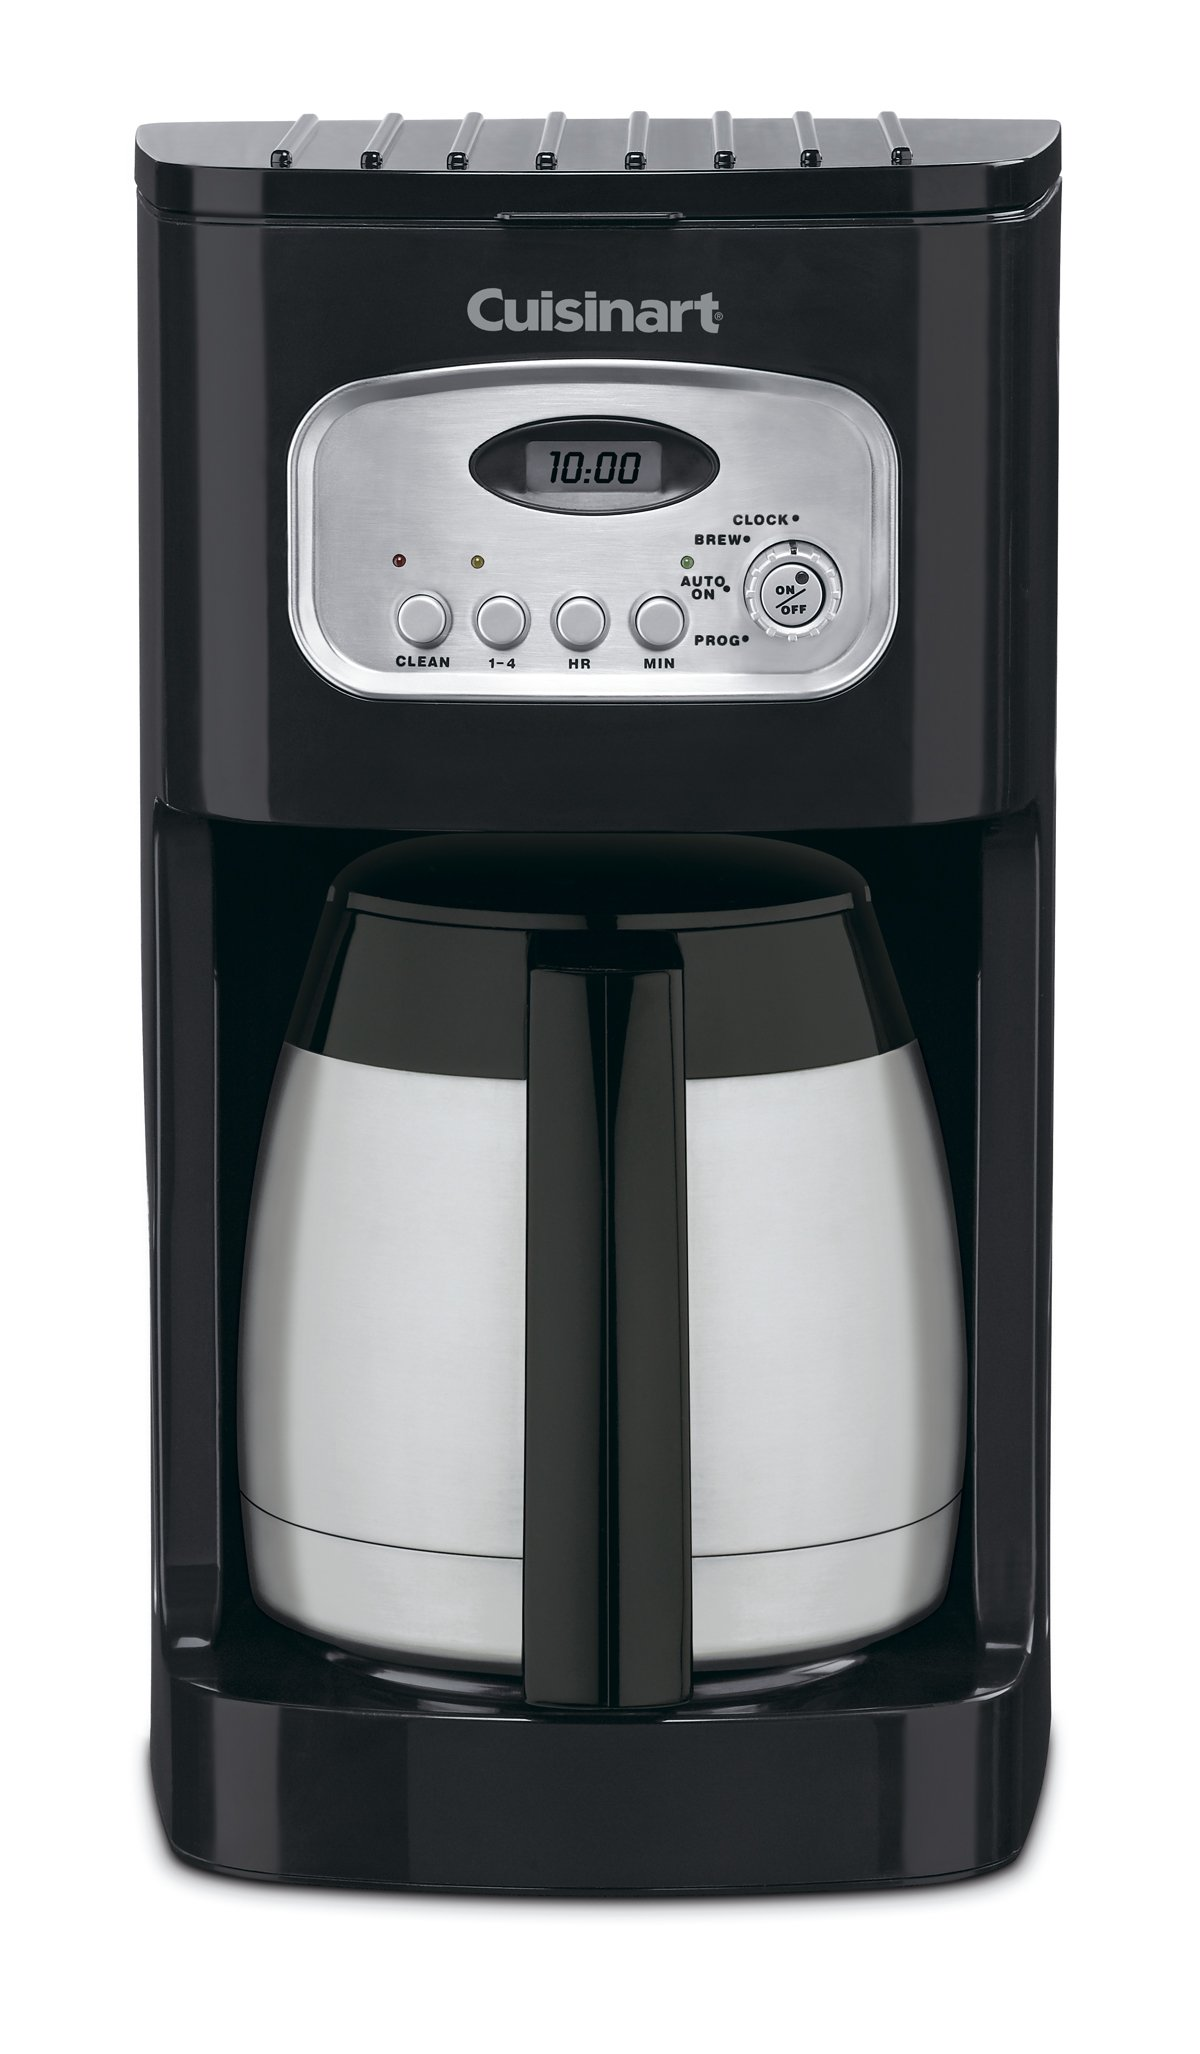 Cuisinart DCC 1150BK Classic Programmable Coffeemaker